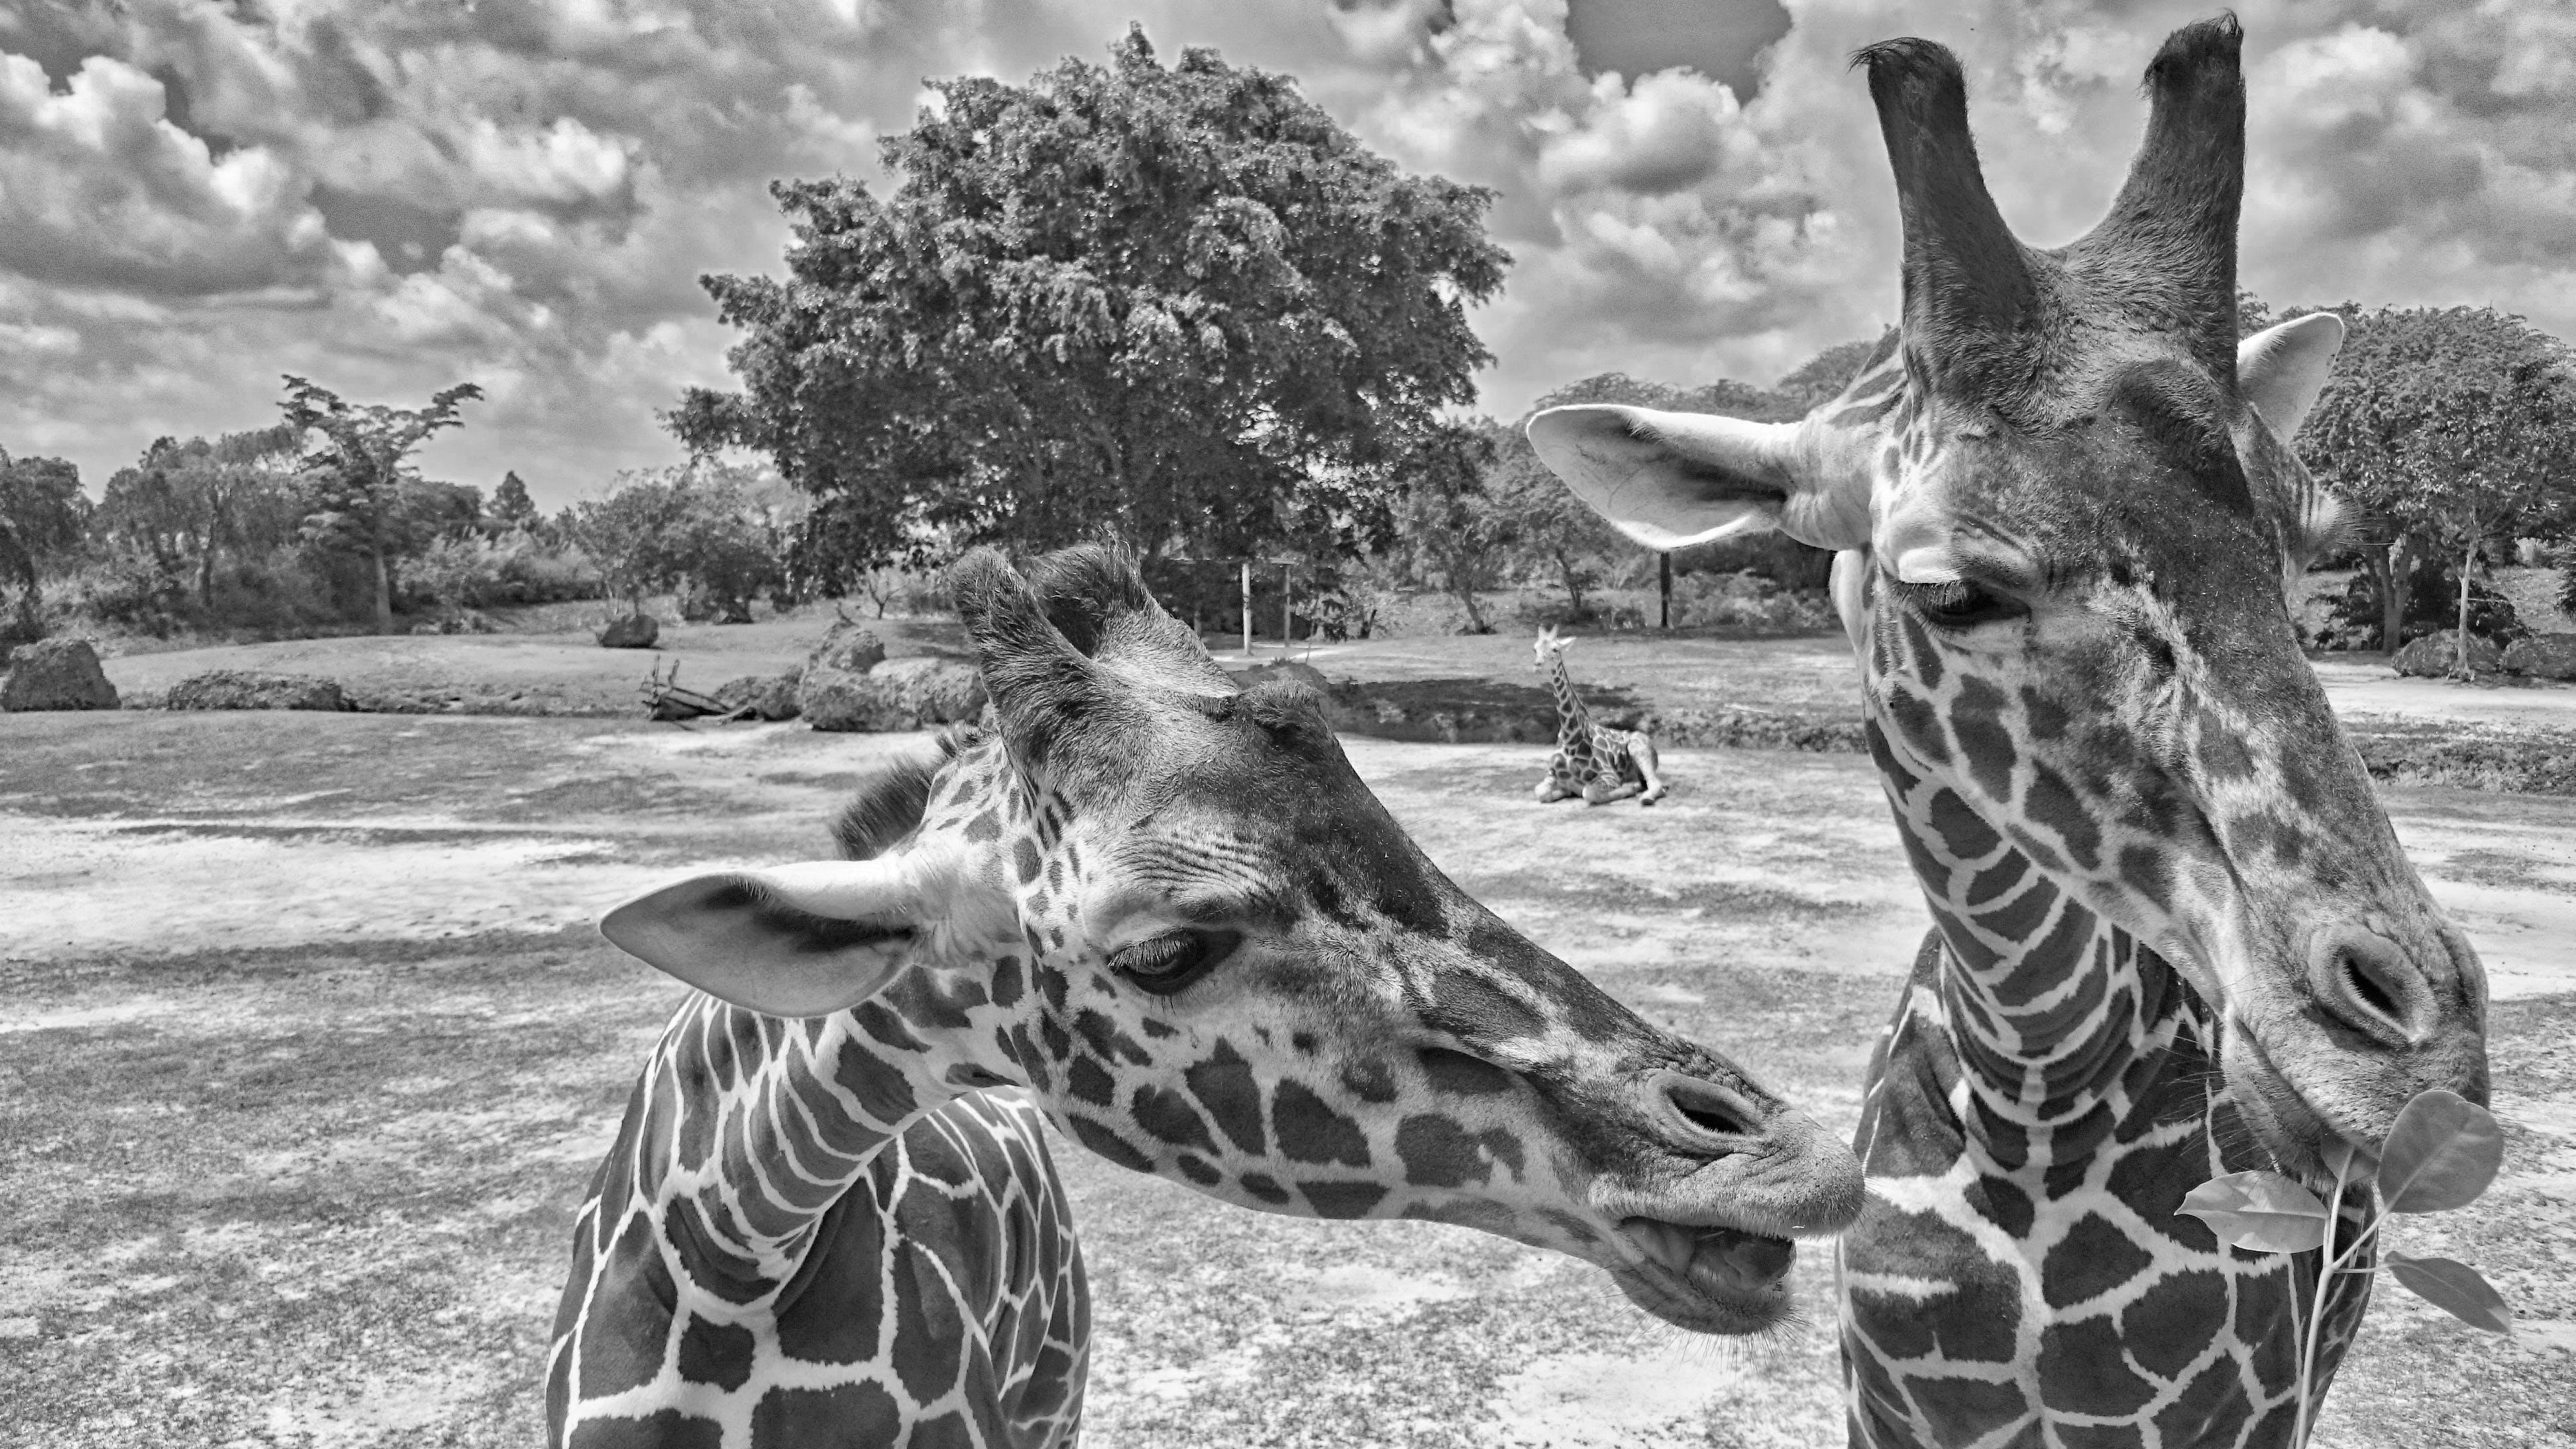 Giraffe's Head Close to Another Giraffe's Neck